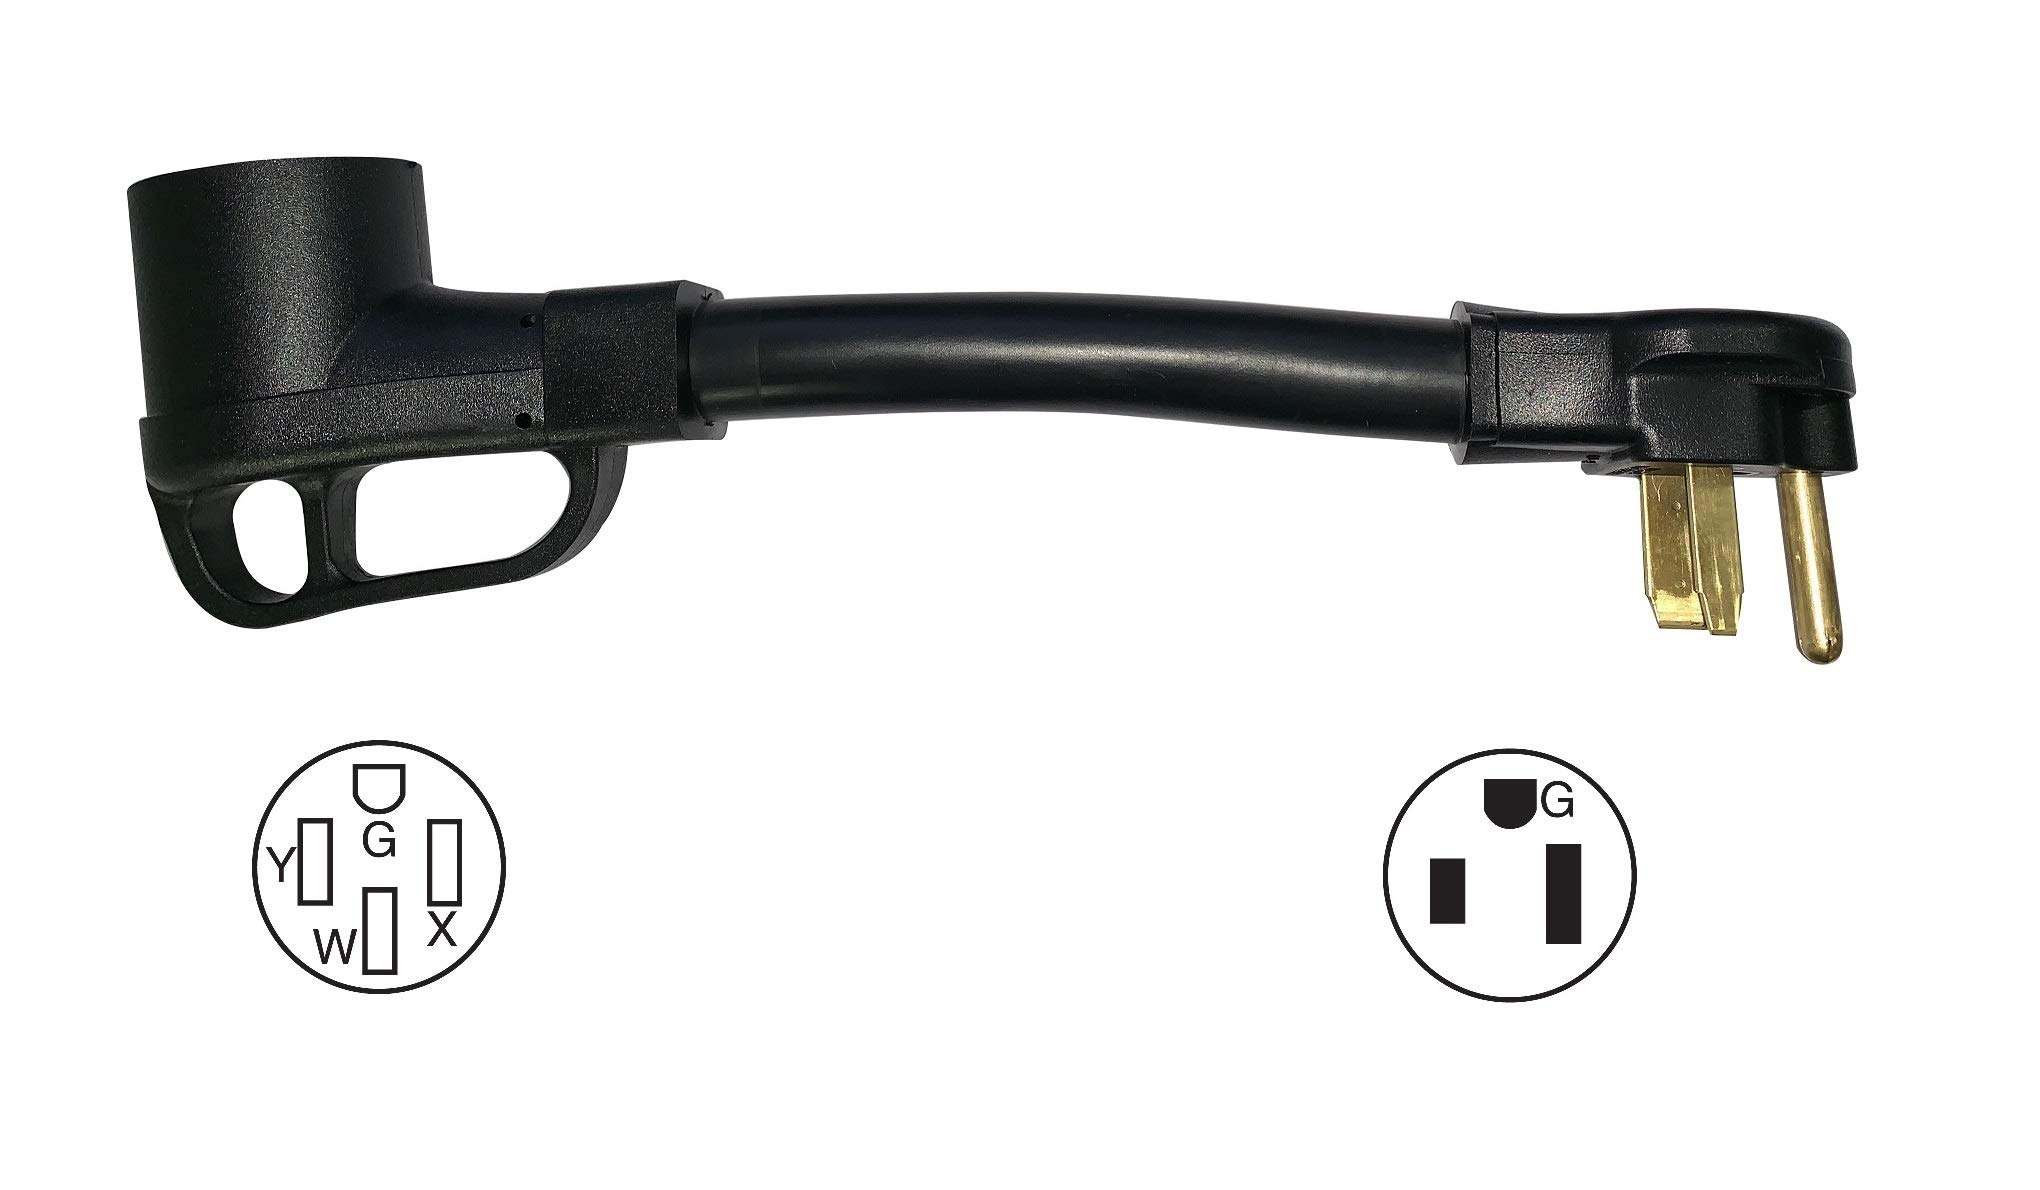 ONETAK NEMA 6-50P to 14-50R 240V 50 Amp Welder Welding Dryer EV Charger Power Cord Adapter Adaptor Connector Connecter by ONETAK